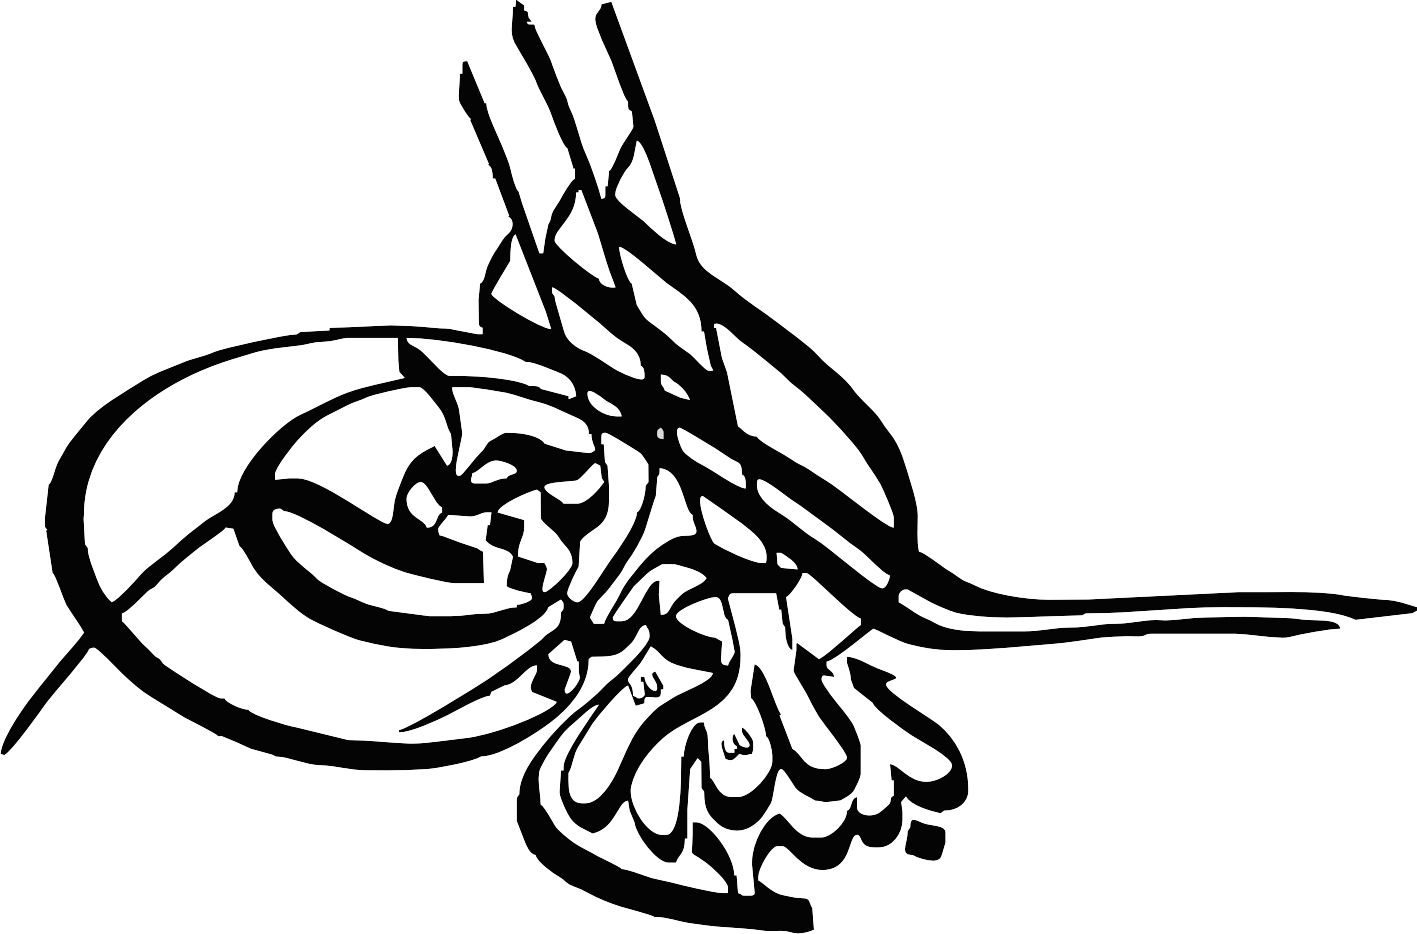 pictures-besmellah-www-mjjz_-ir-213